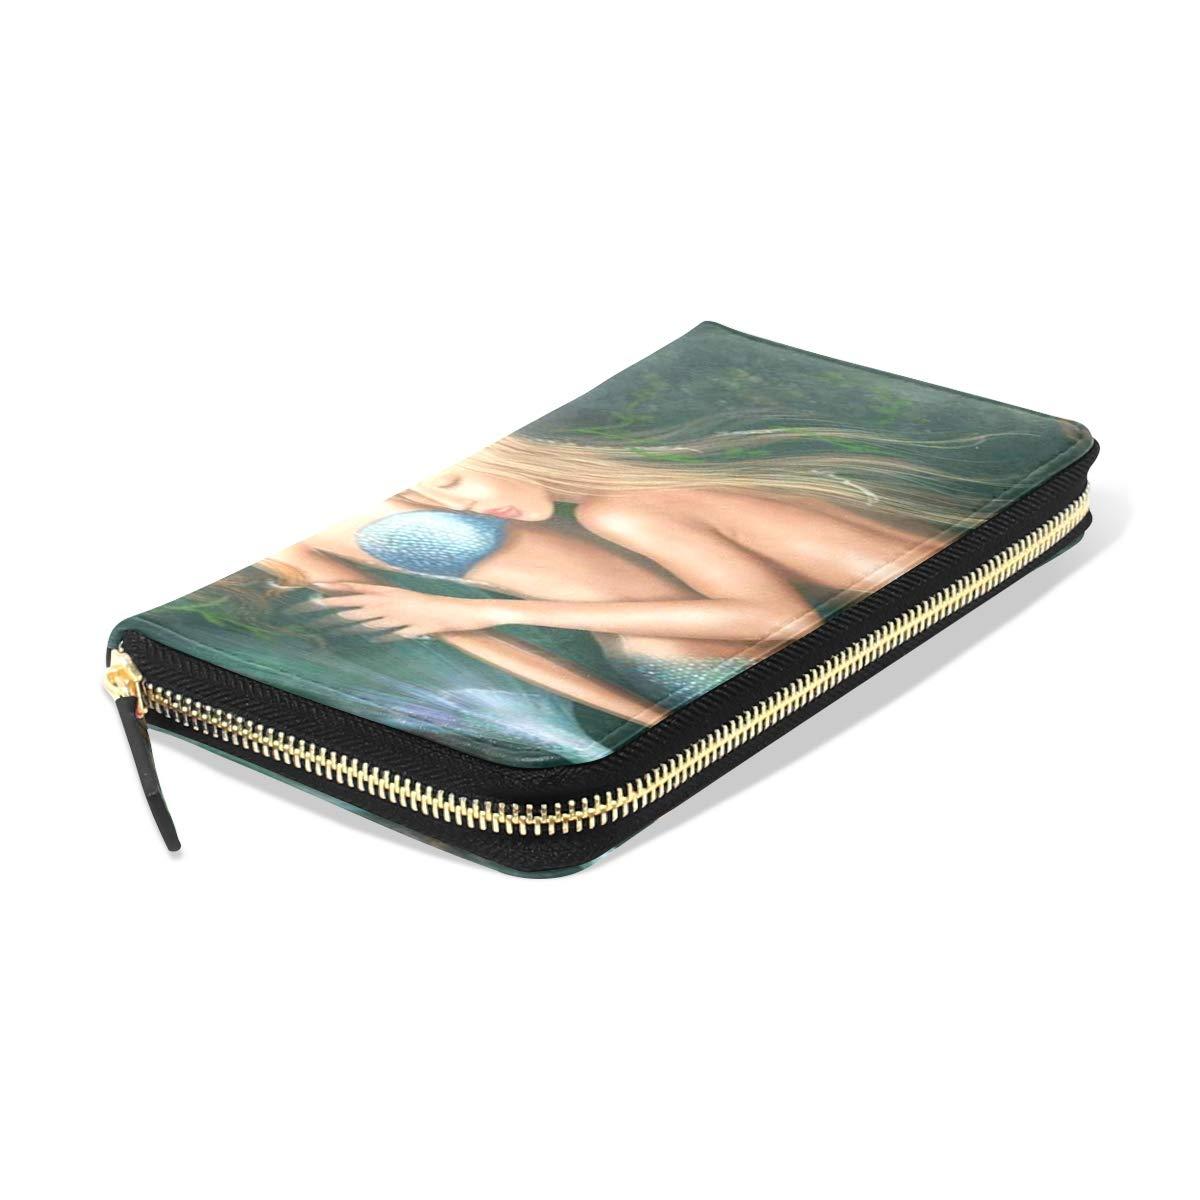 Womens Wallets Princess Mermaids Lake Leather Passport Wallet Coin Purse Girls Handbags